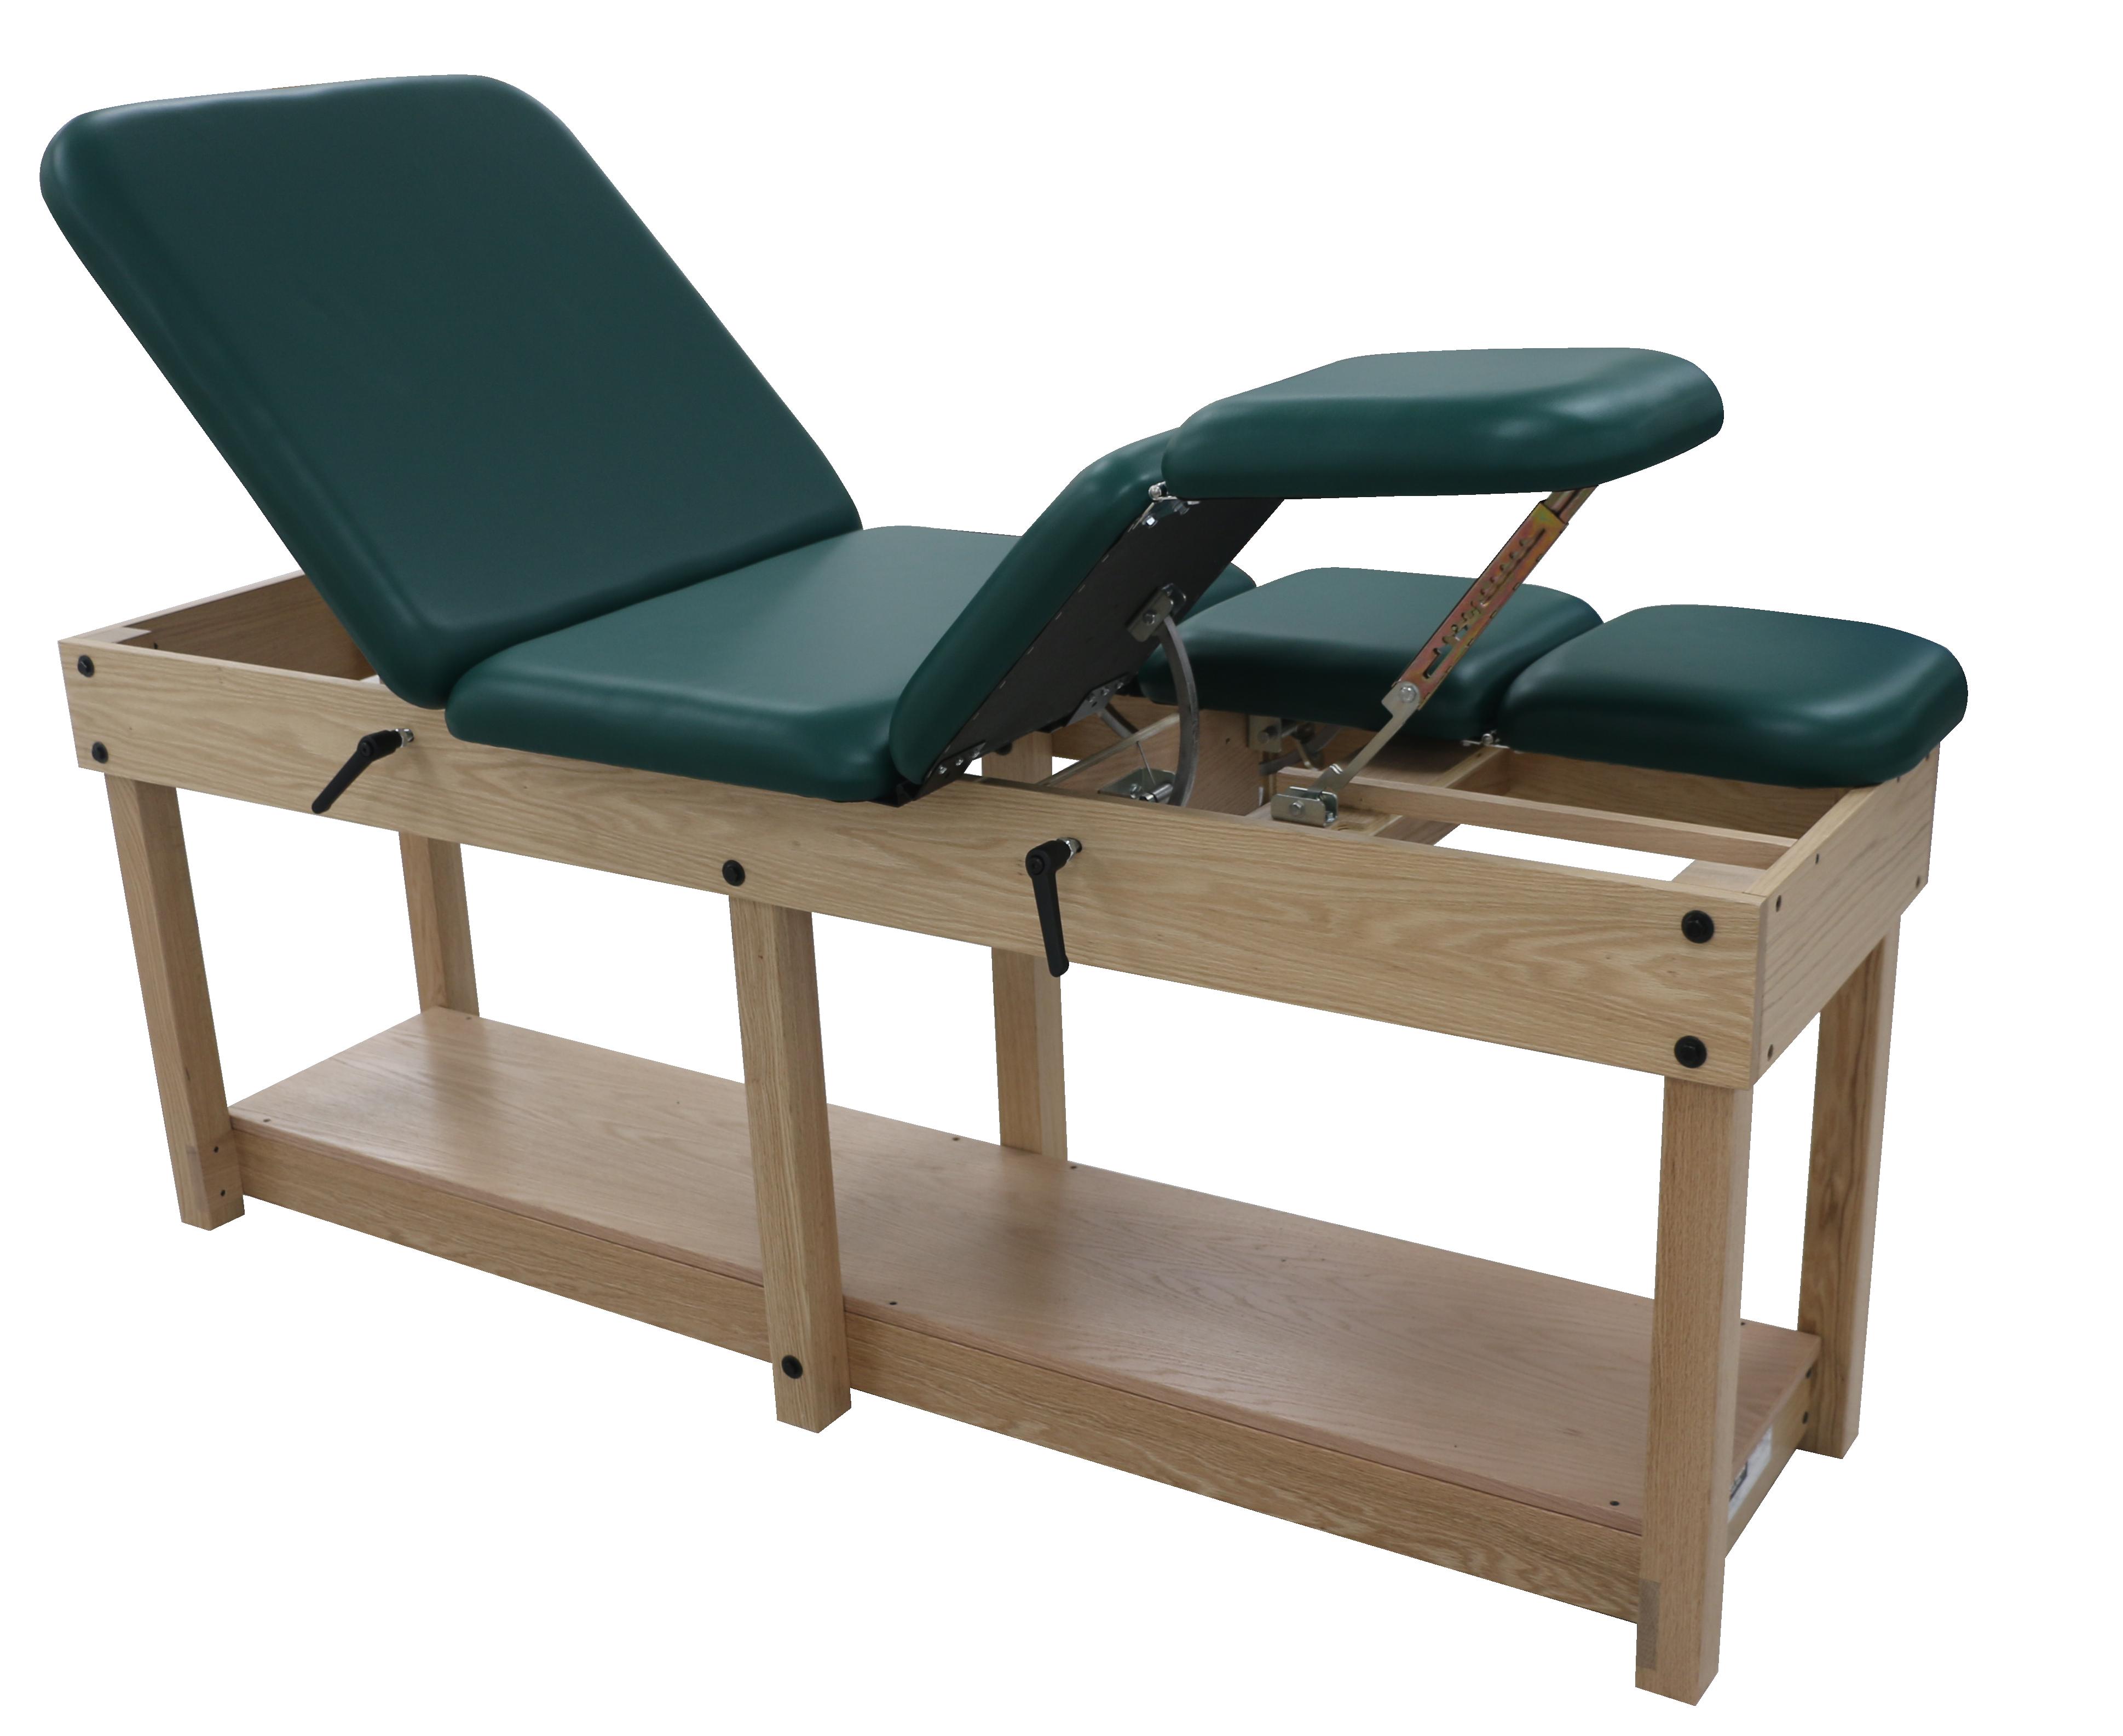 HIP & KNEE FLEXION TREATMENT TABLE